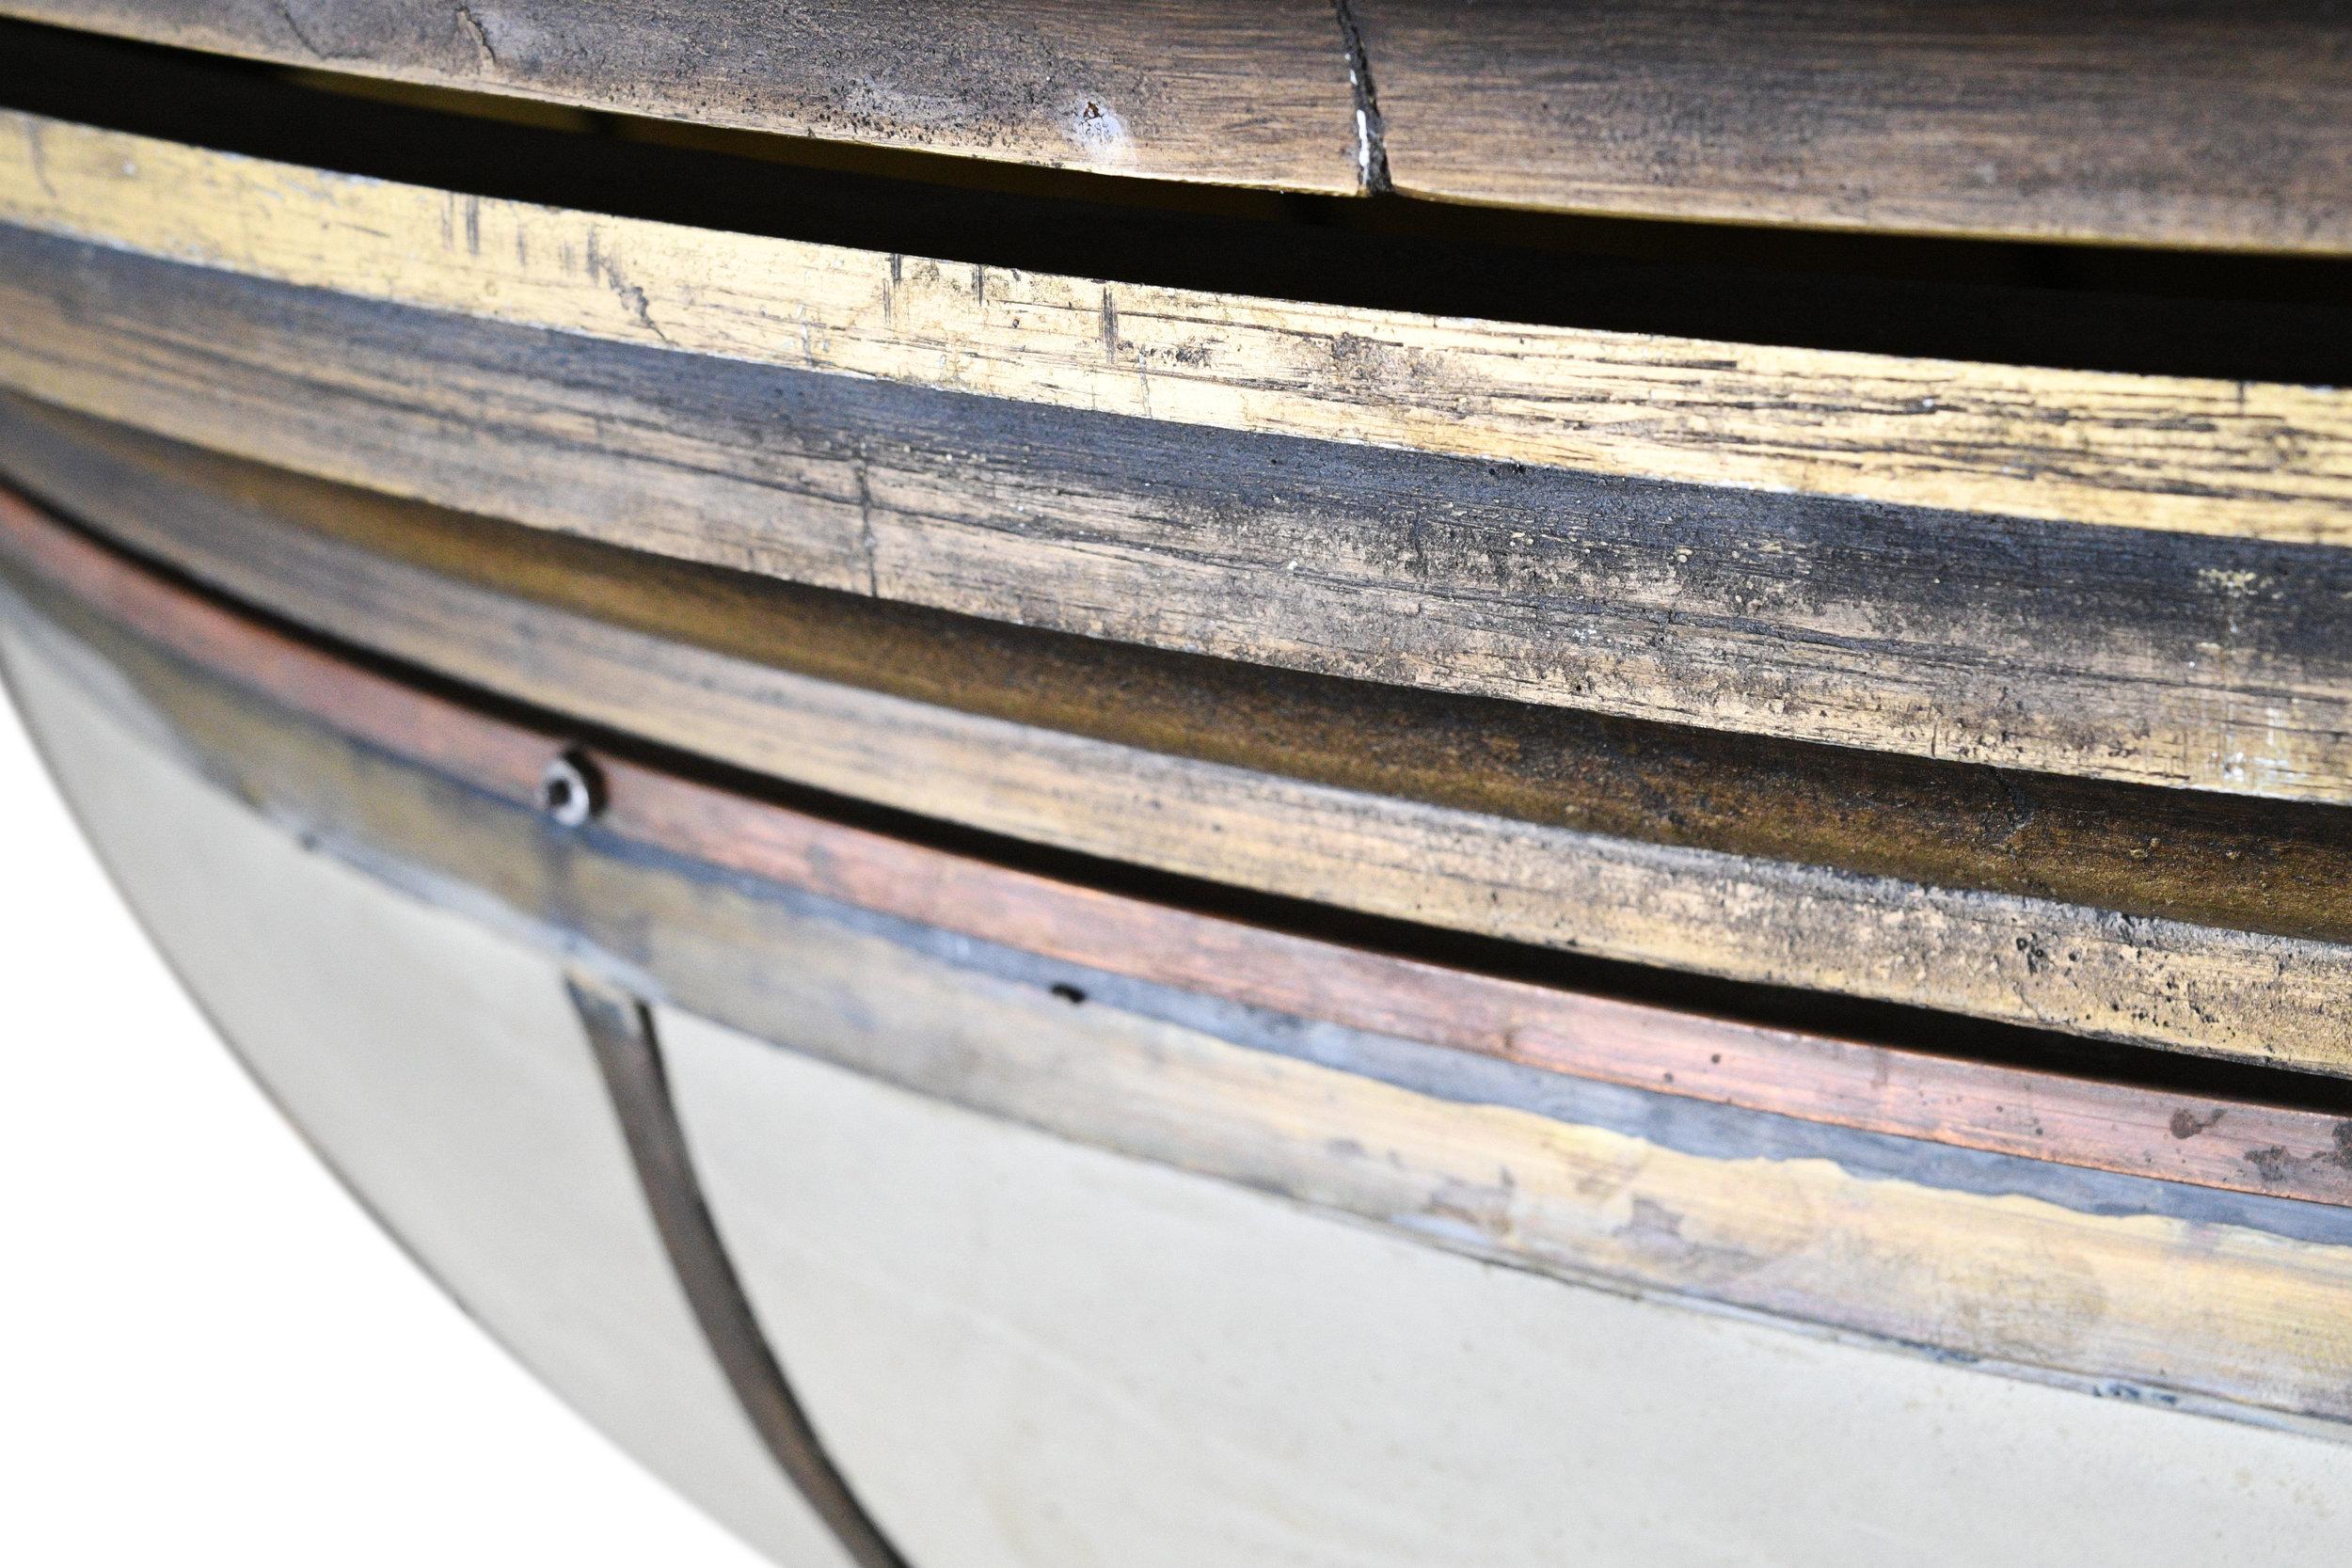 47787-large-flushmount-bowl-with-glass-4.jpg